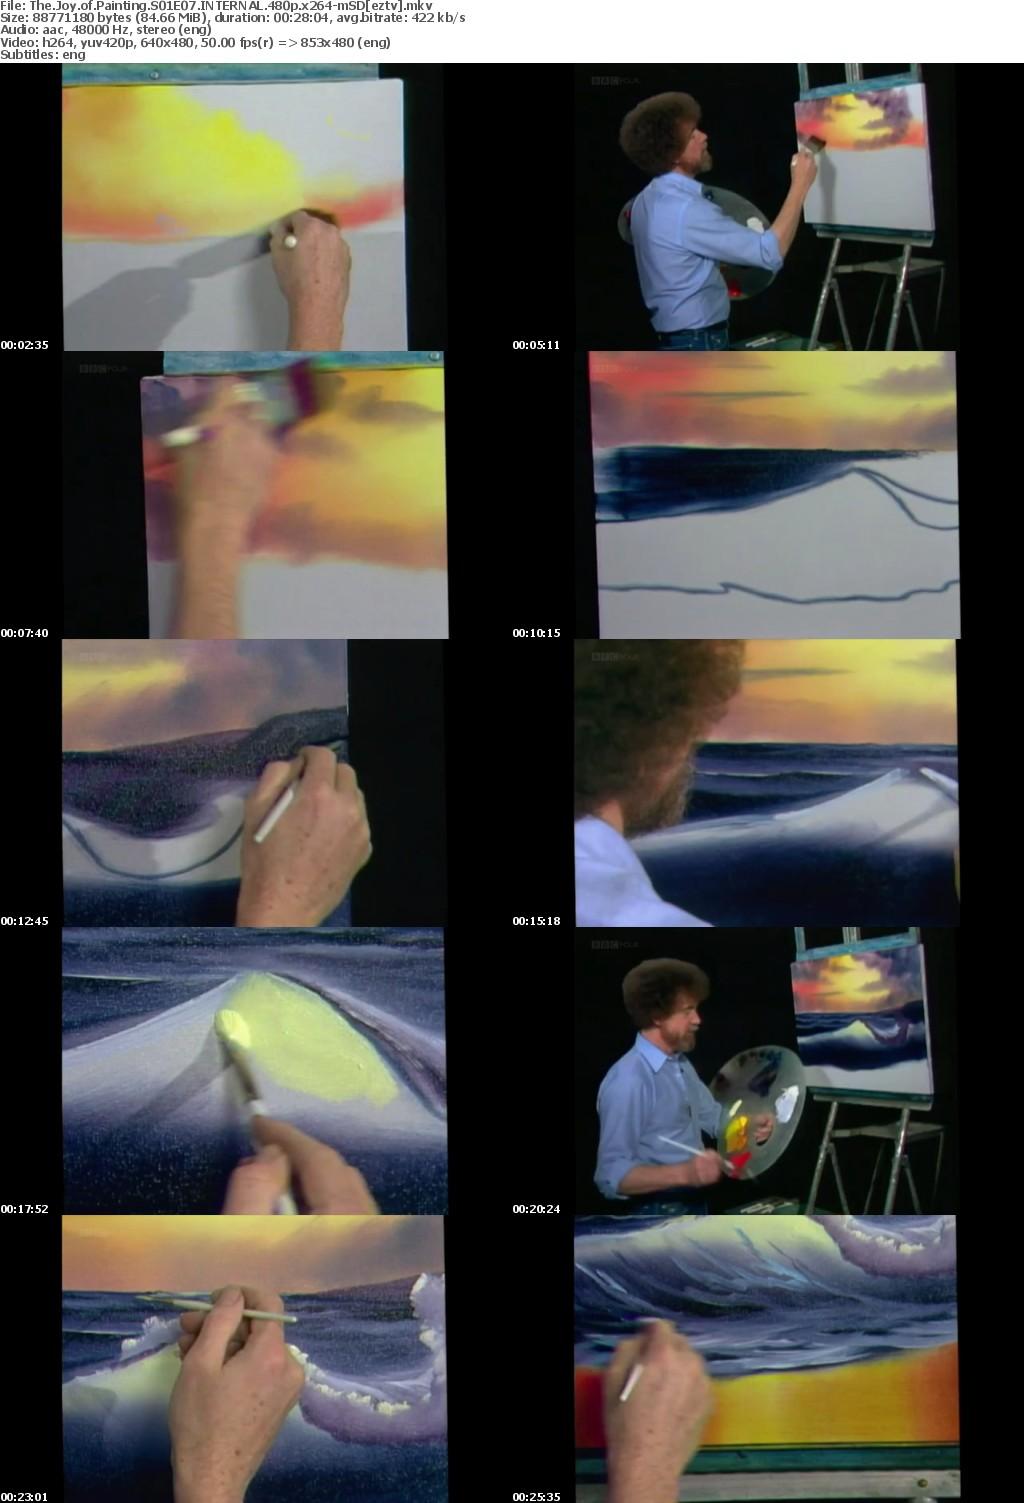 The Joy of Painting S01E07 INTERNAL 480p x264-mSD